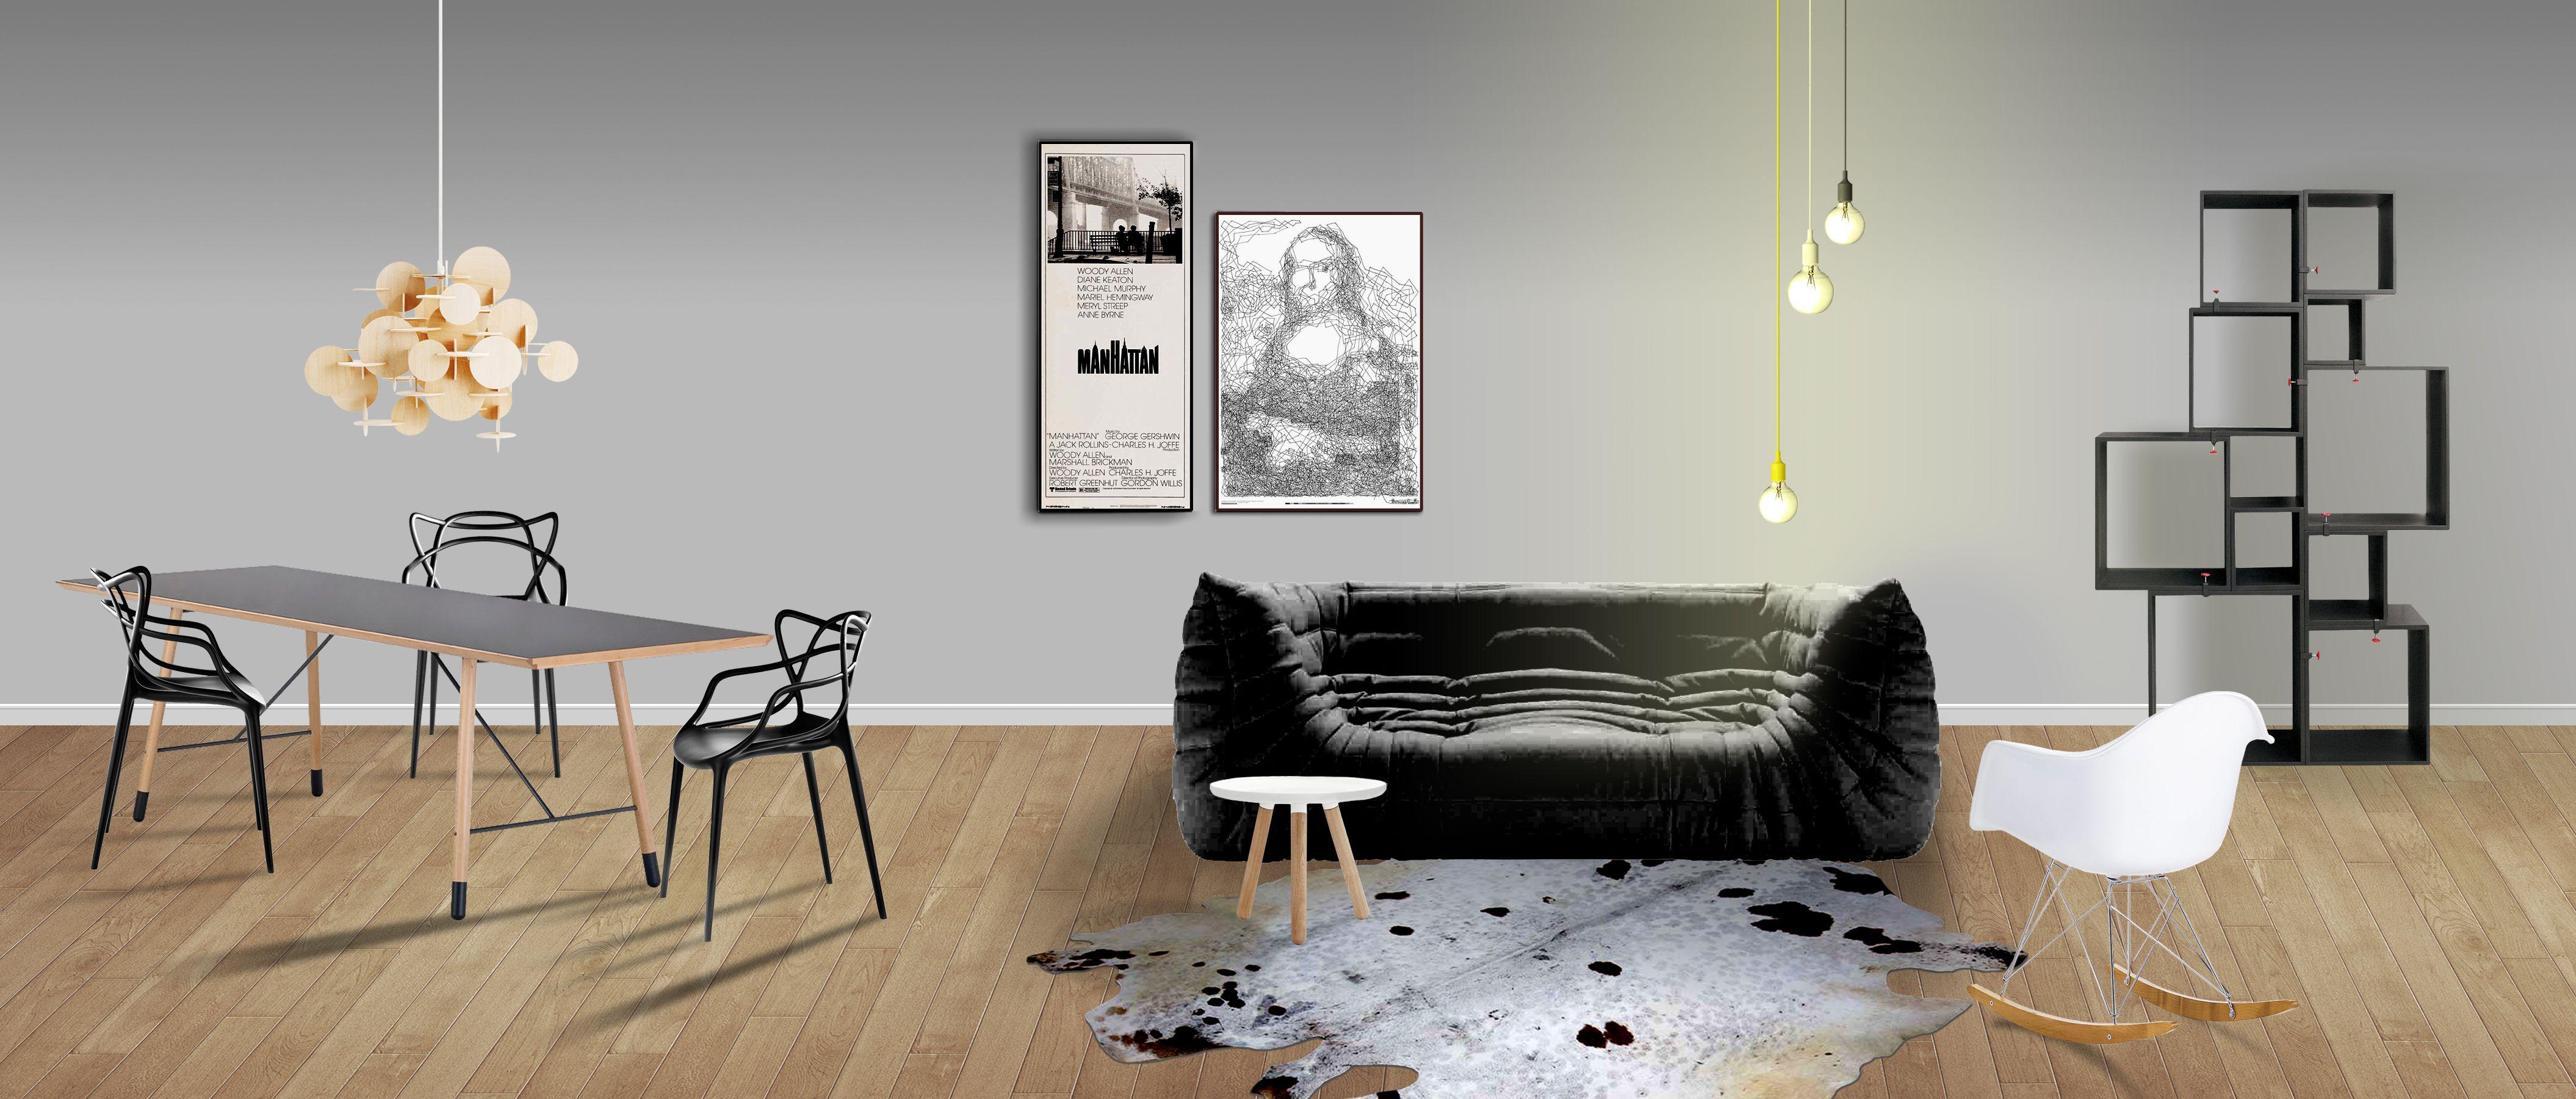 Low budjet divano togo di michel ducaroy per ligne roset poltroncina rar rocking chair di - Divano togo ligne roset ...